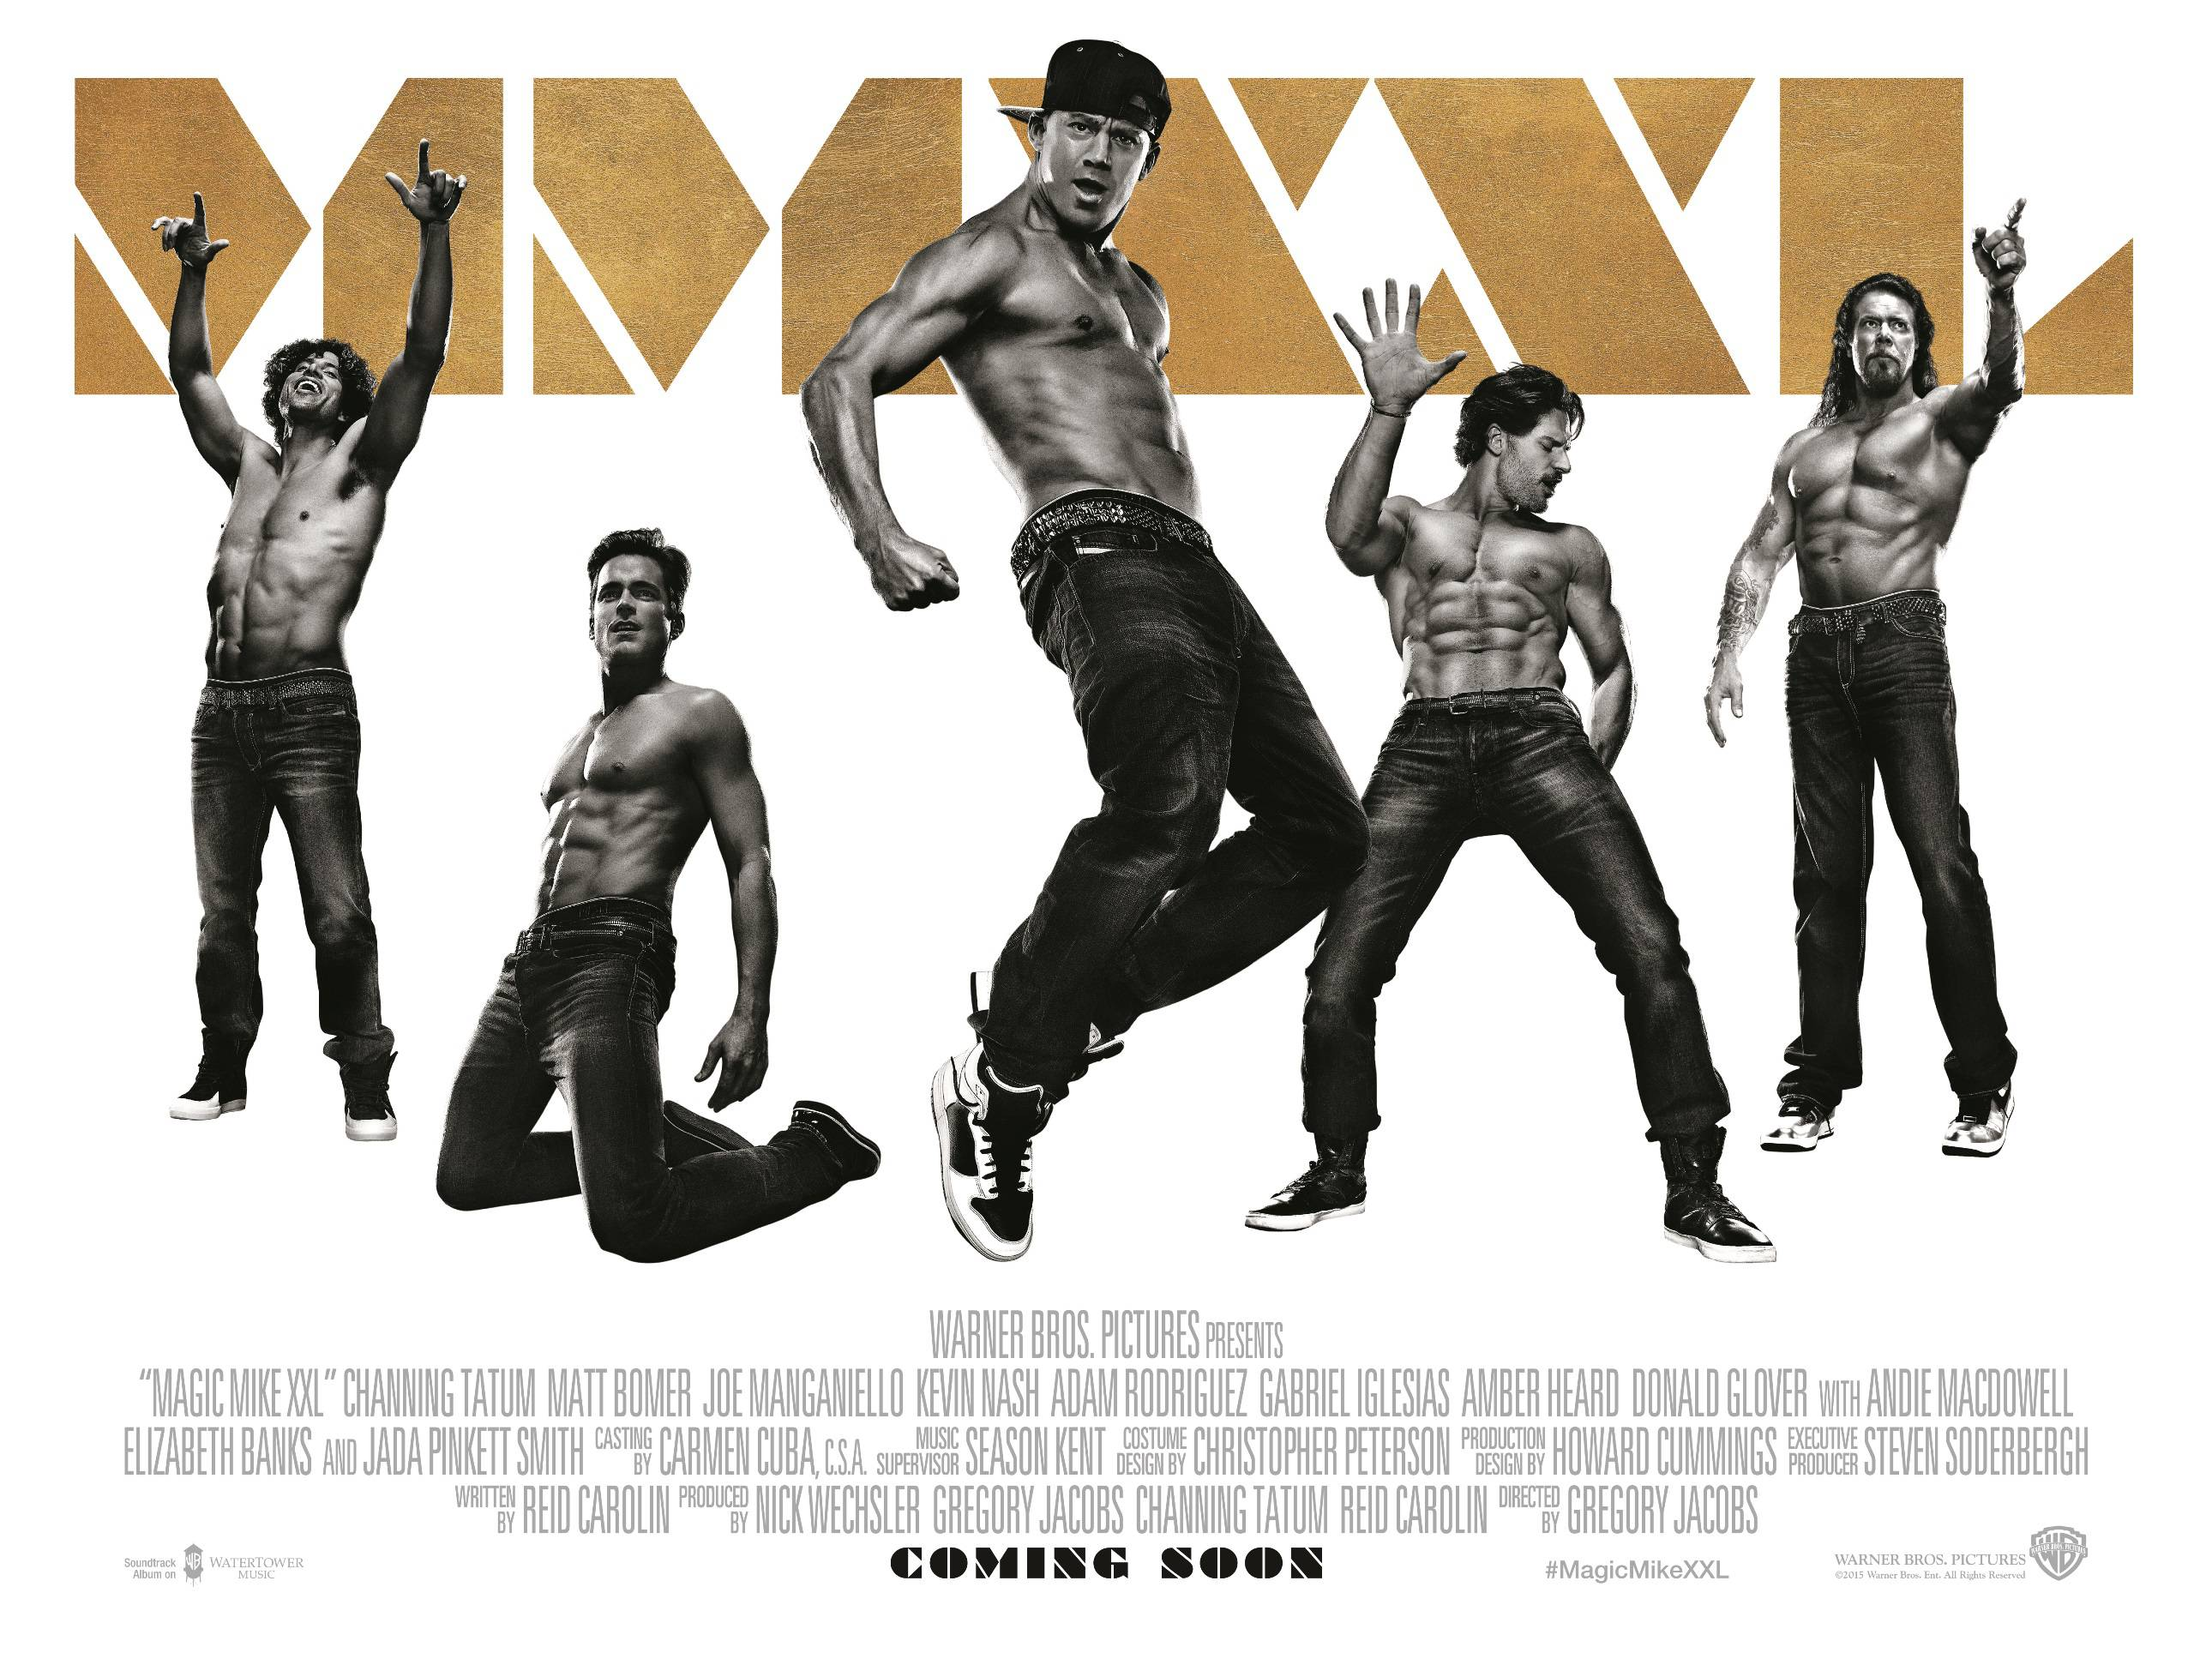 O Filme da Semana - Magic Mike XXL [2015]